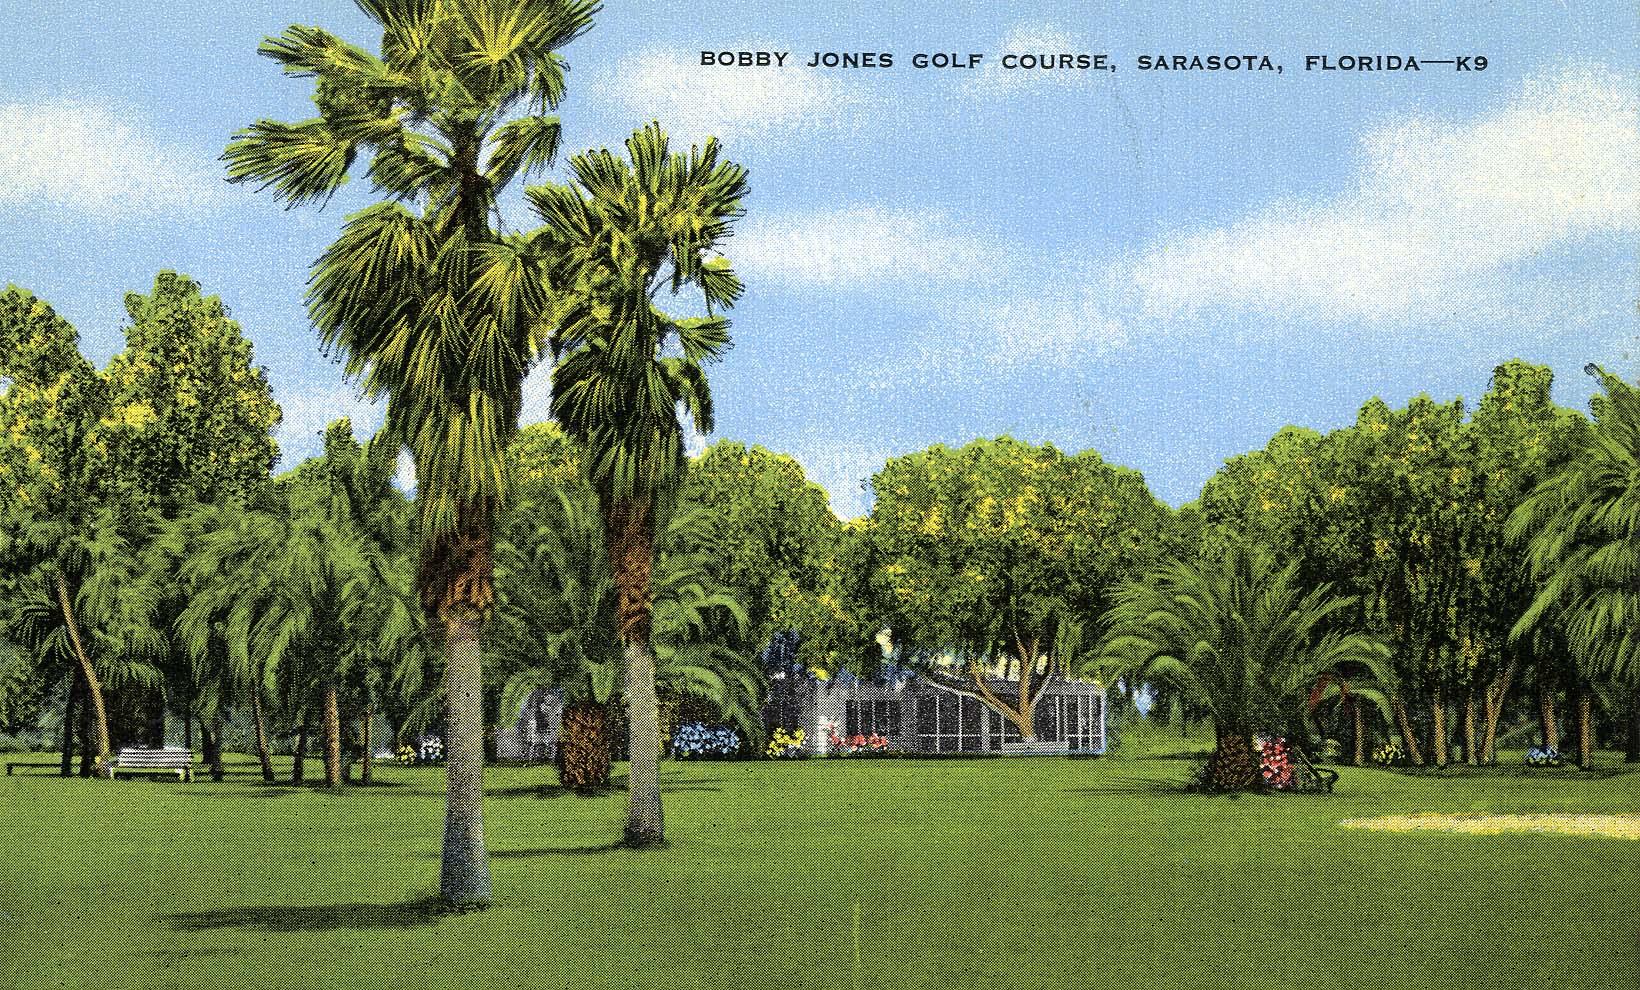 VINTAGE POSTCARD Bobby Jones Golf Club, Sarasota Florida.